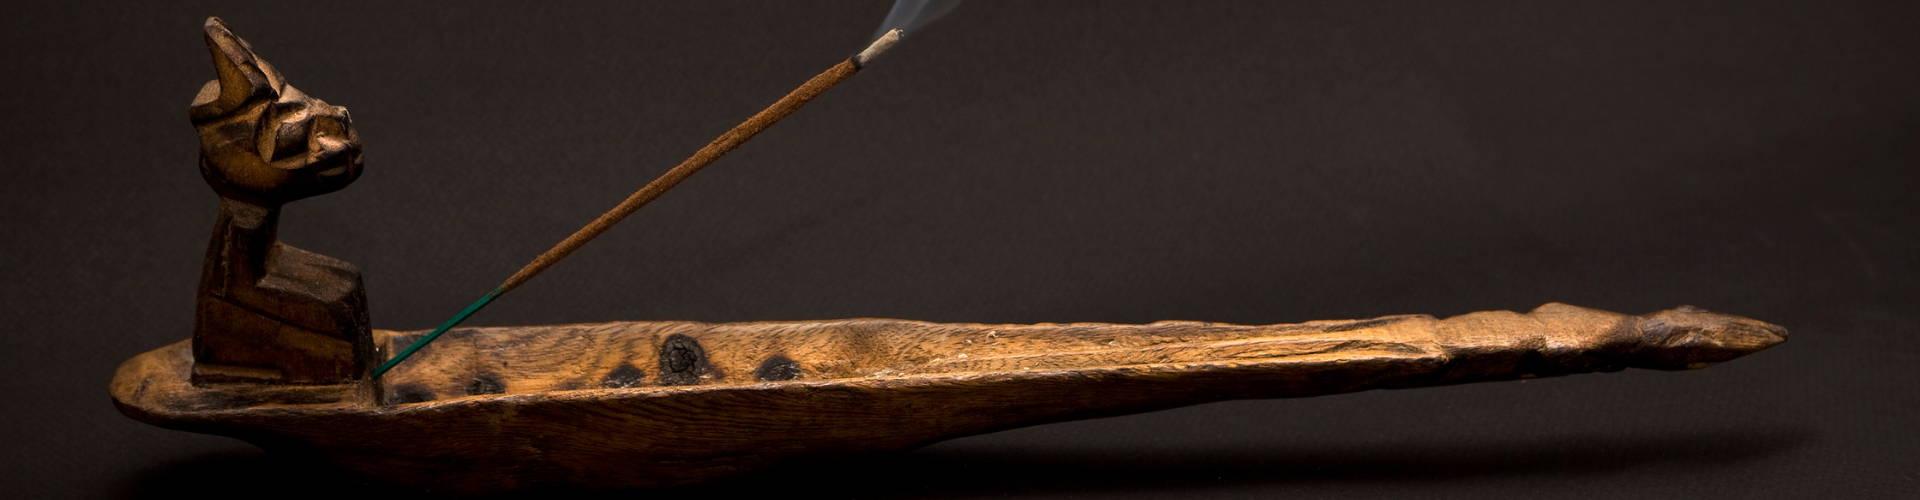 natural incense sticks burning